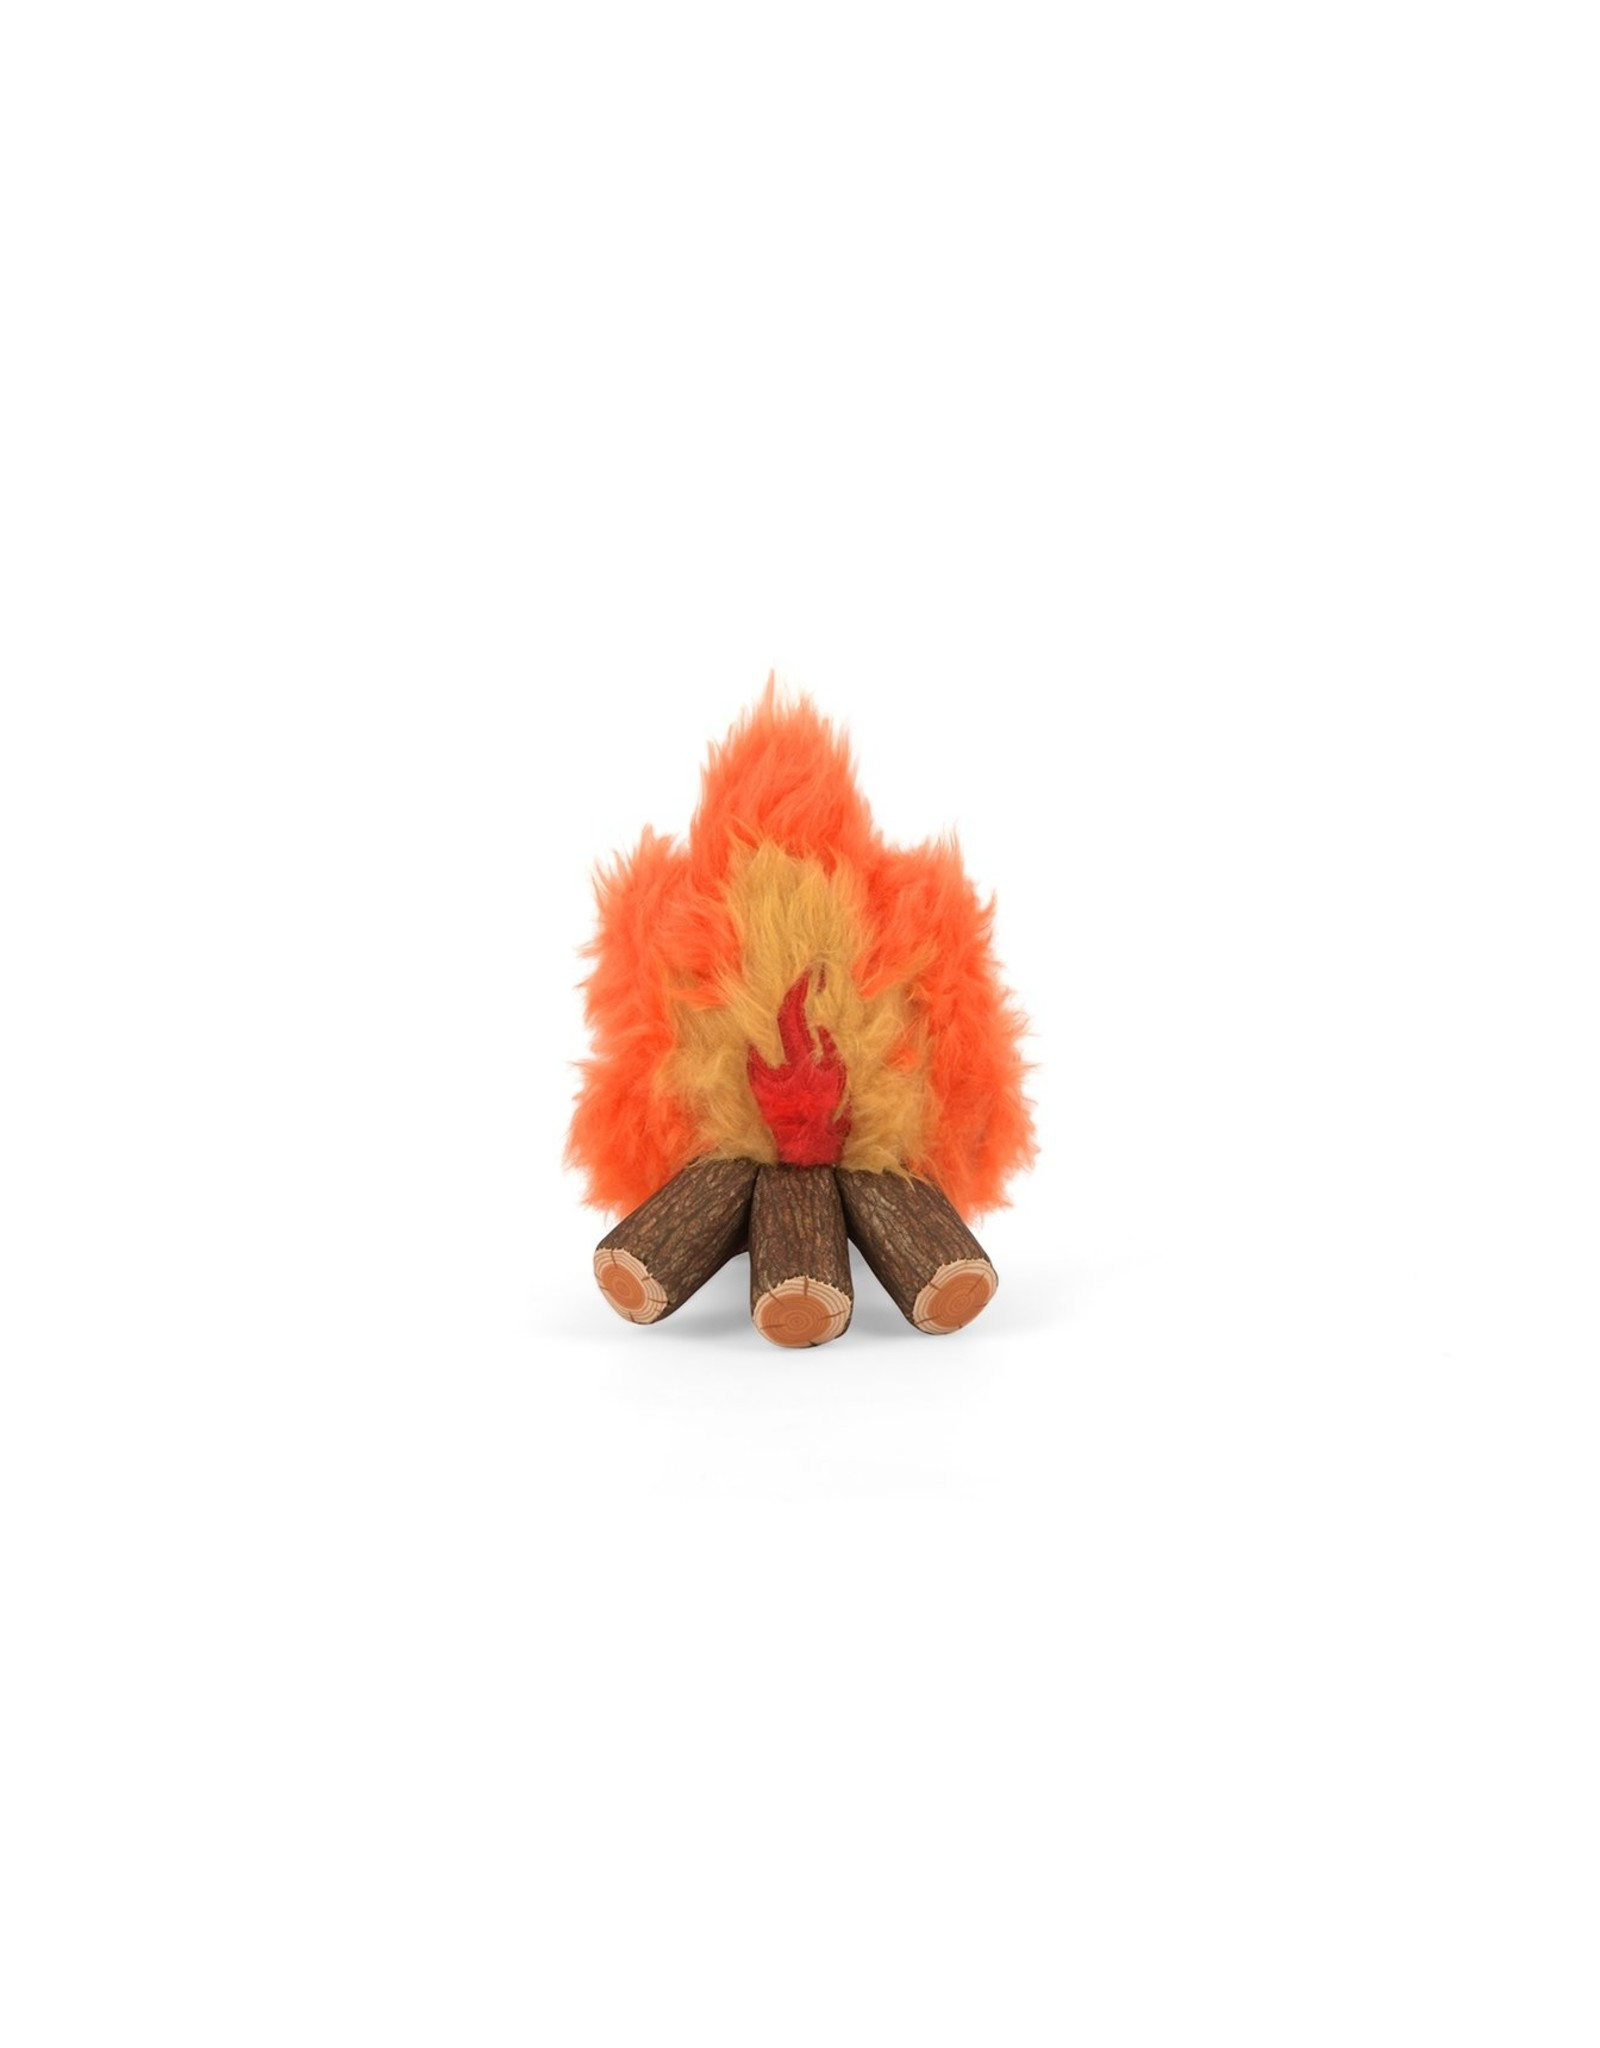 PLAY Pet Lifestyle Camp Corbin Cozy Camp Fire